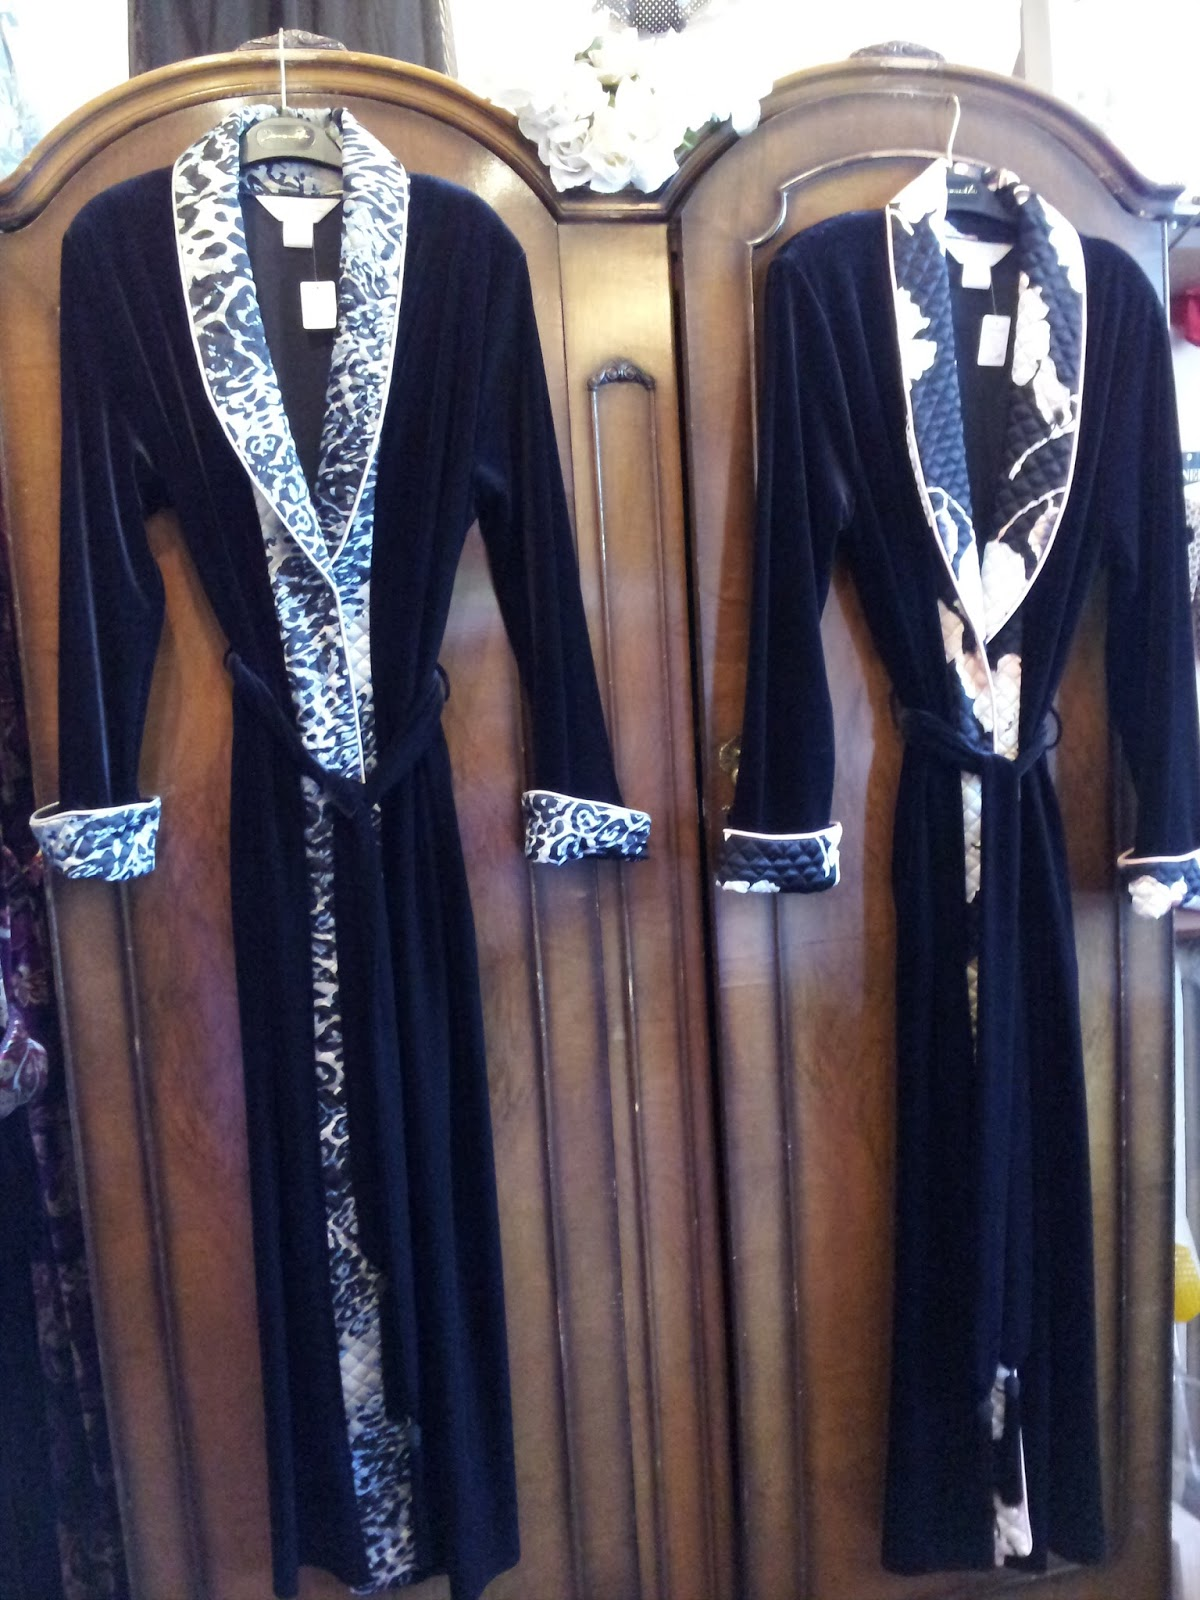 a069e8c8e7 Victoria Classic Lingerie  Diamond Tea Robes on Sale!